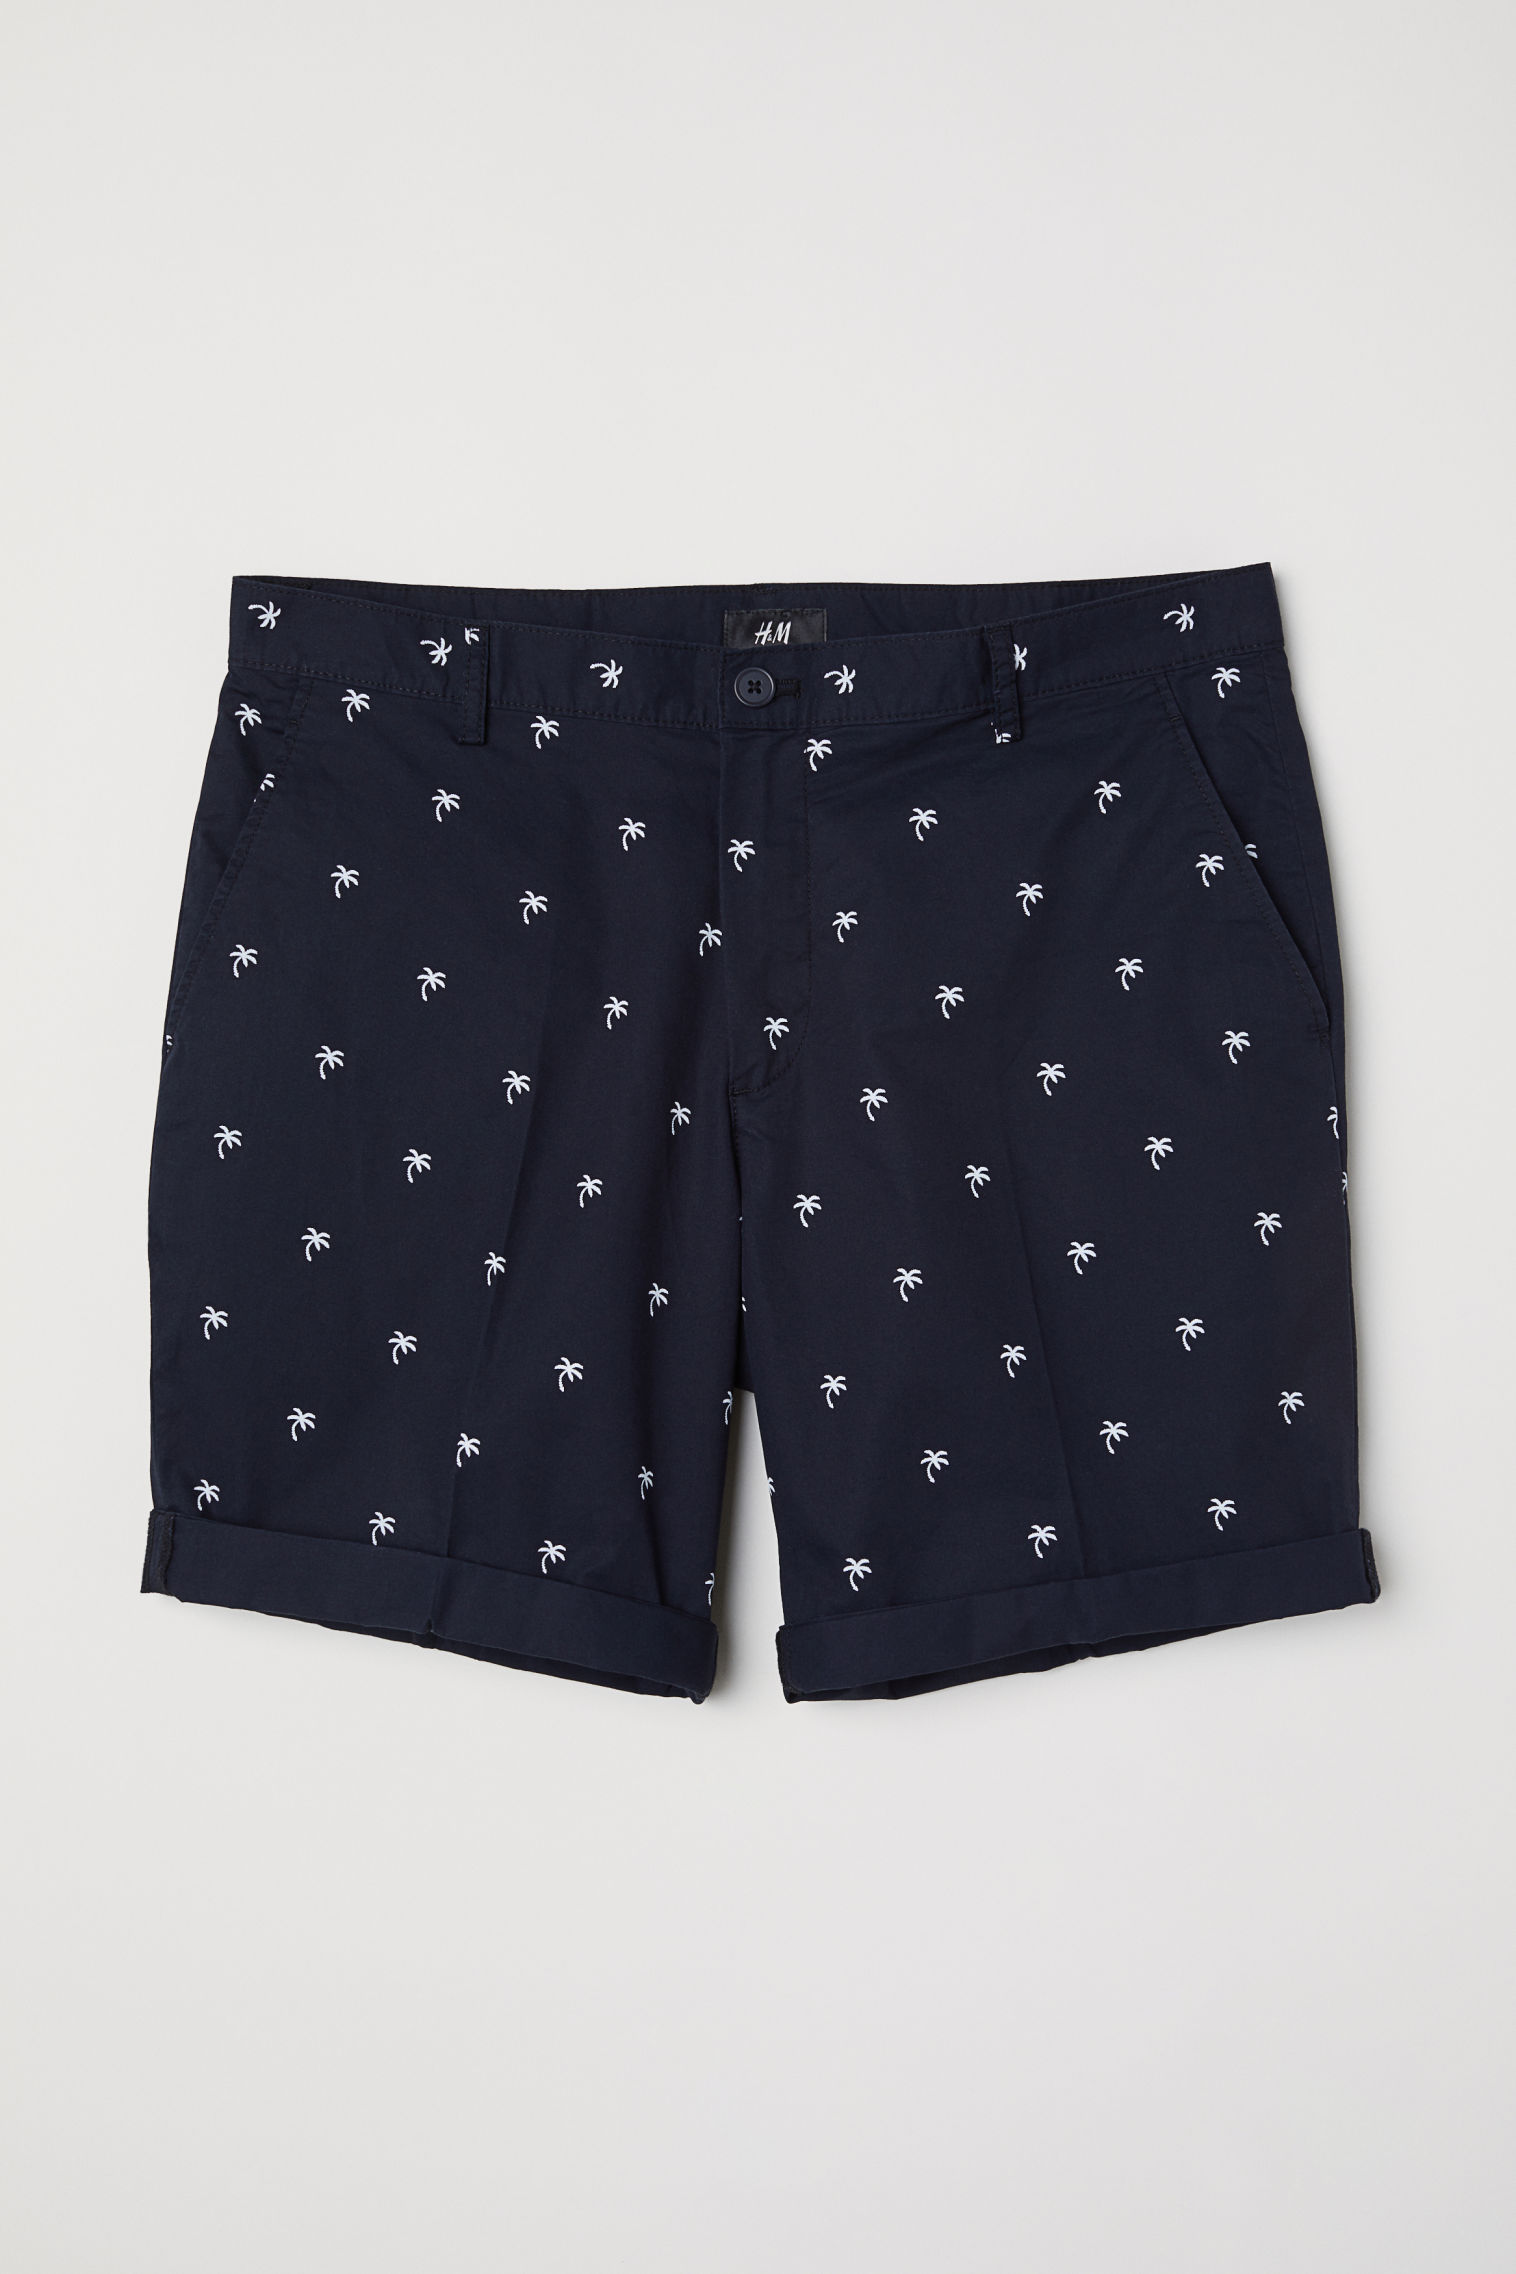 a82d0d779c0 Chino Shorts